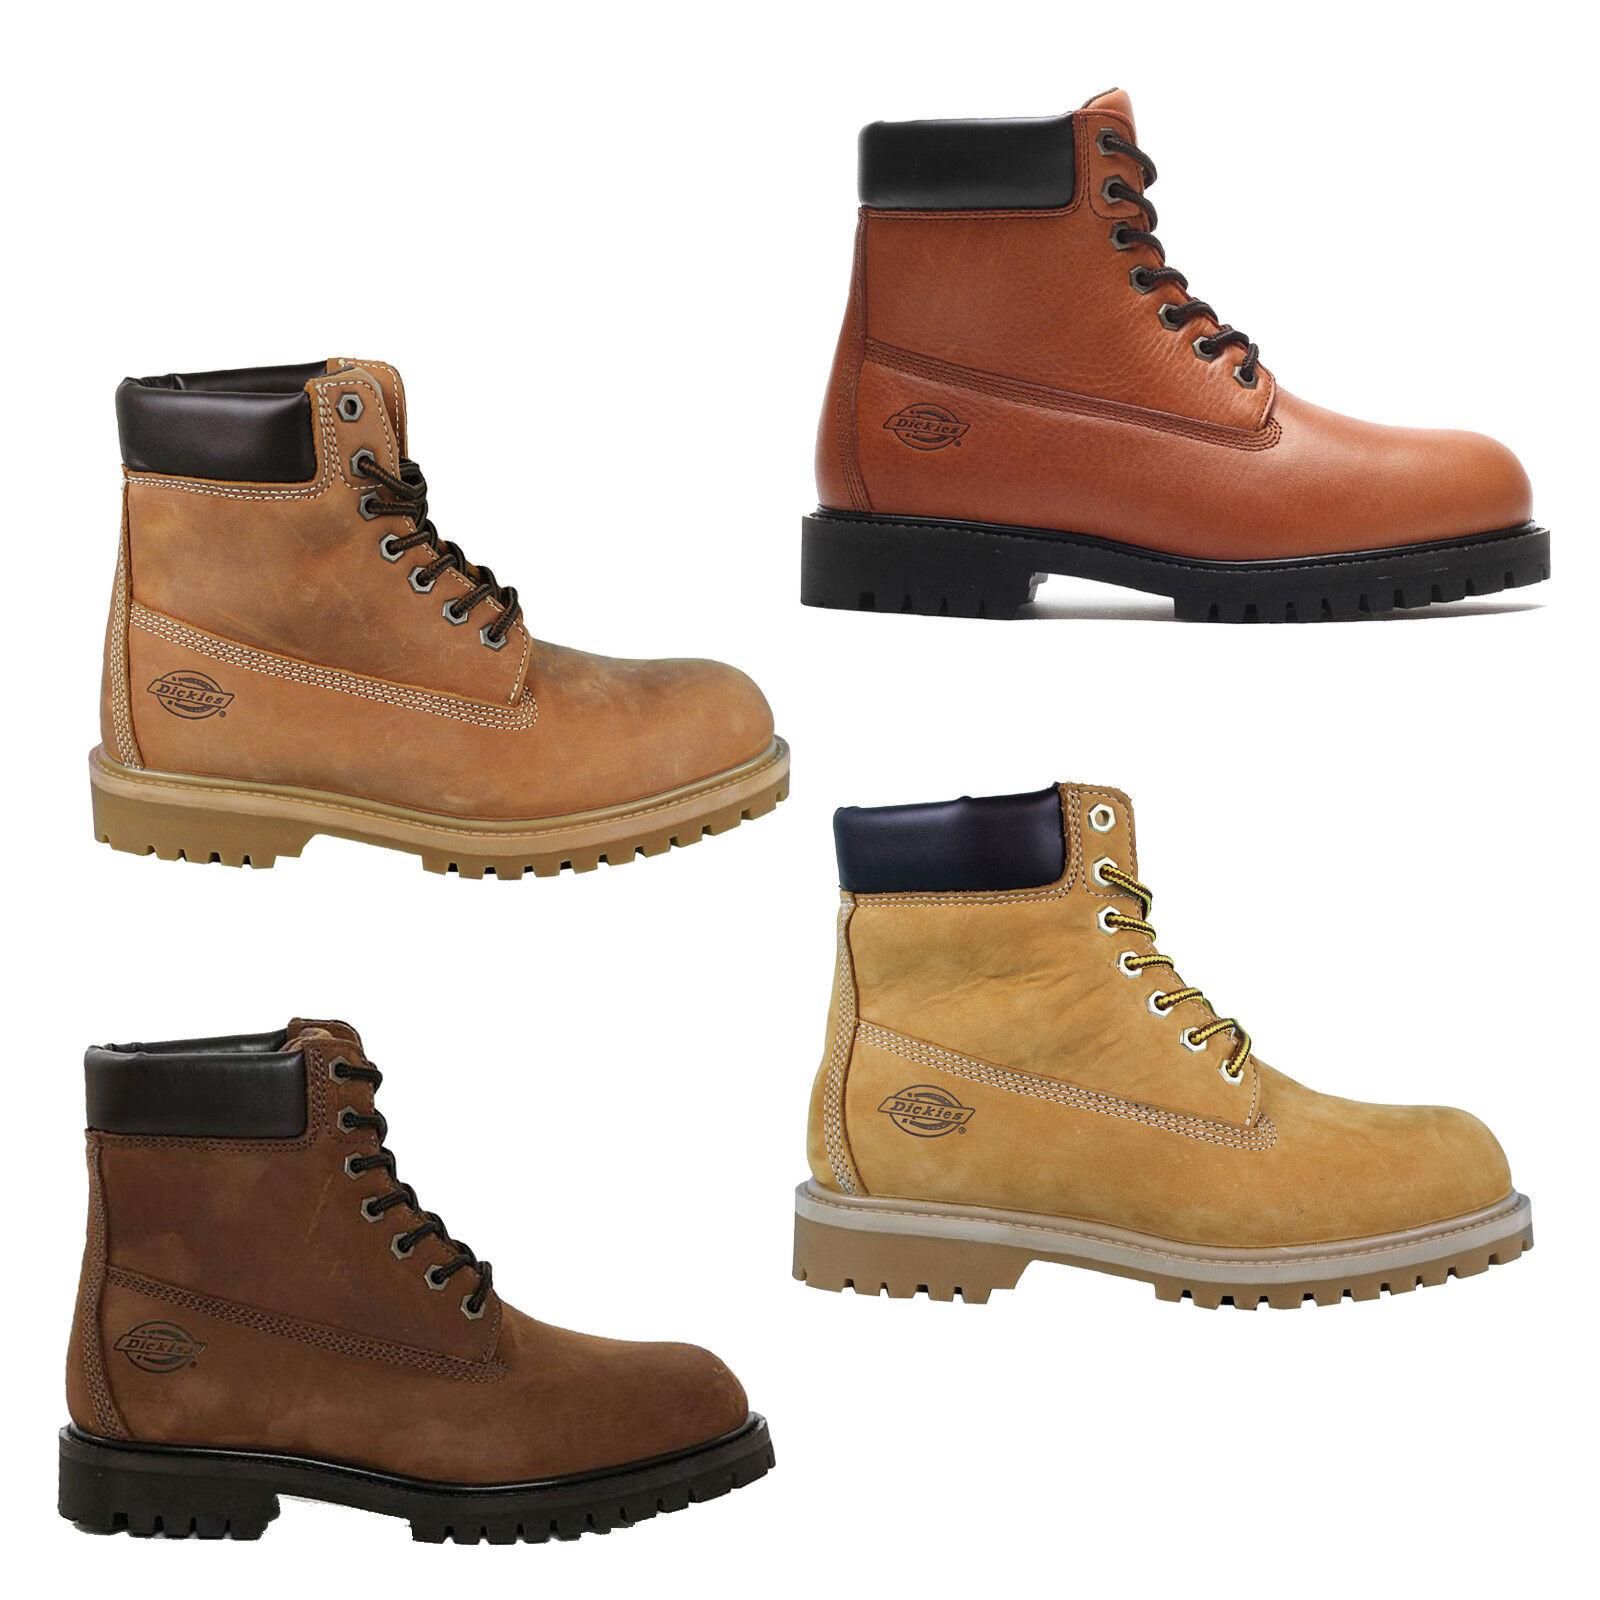 Dickies sur dakota del sur Dickies señores botas de invierno Zapatos de invierno Zapatos de nuevo a4d9d5